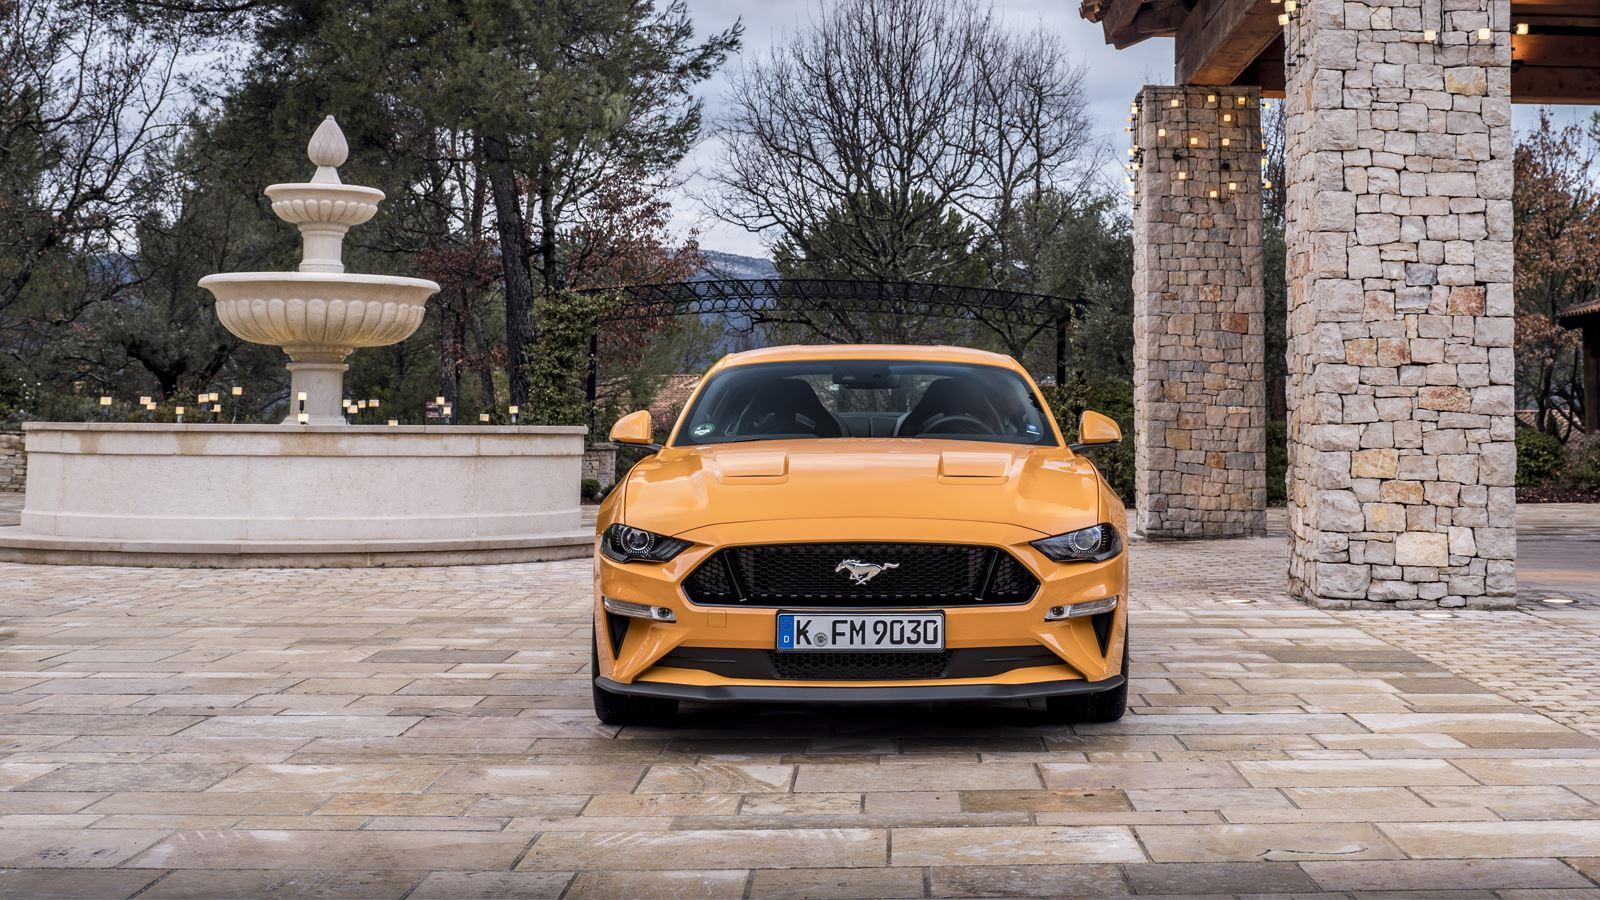 Ford Mustang de imposante voorkant